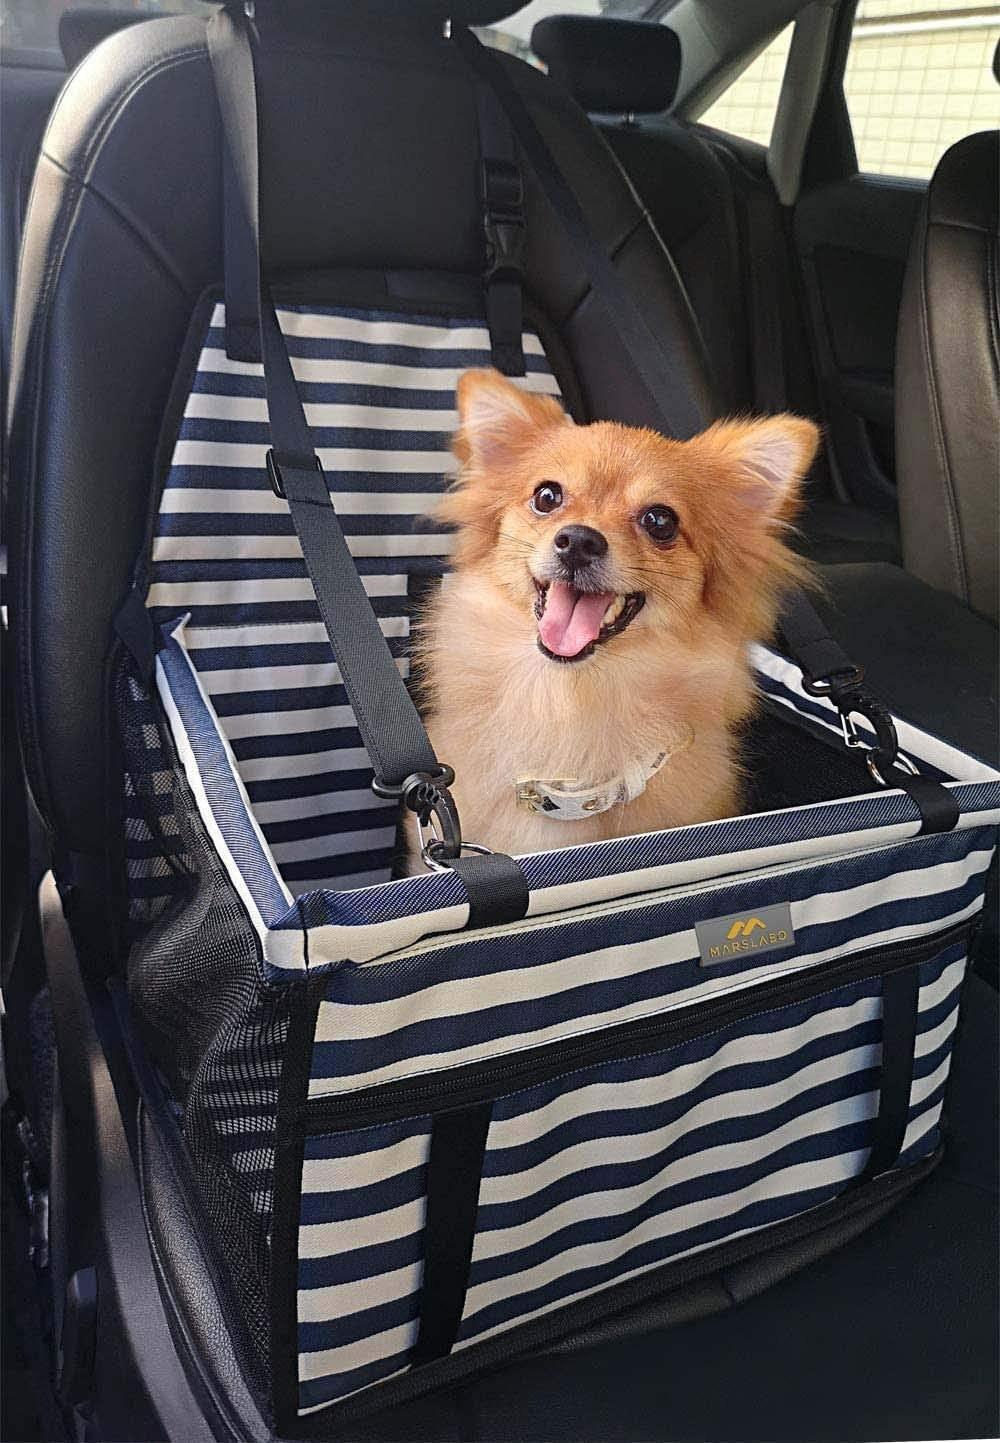 A Pomeranian sits in the blue stripes marslabo dog car seat